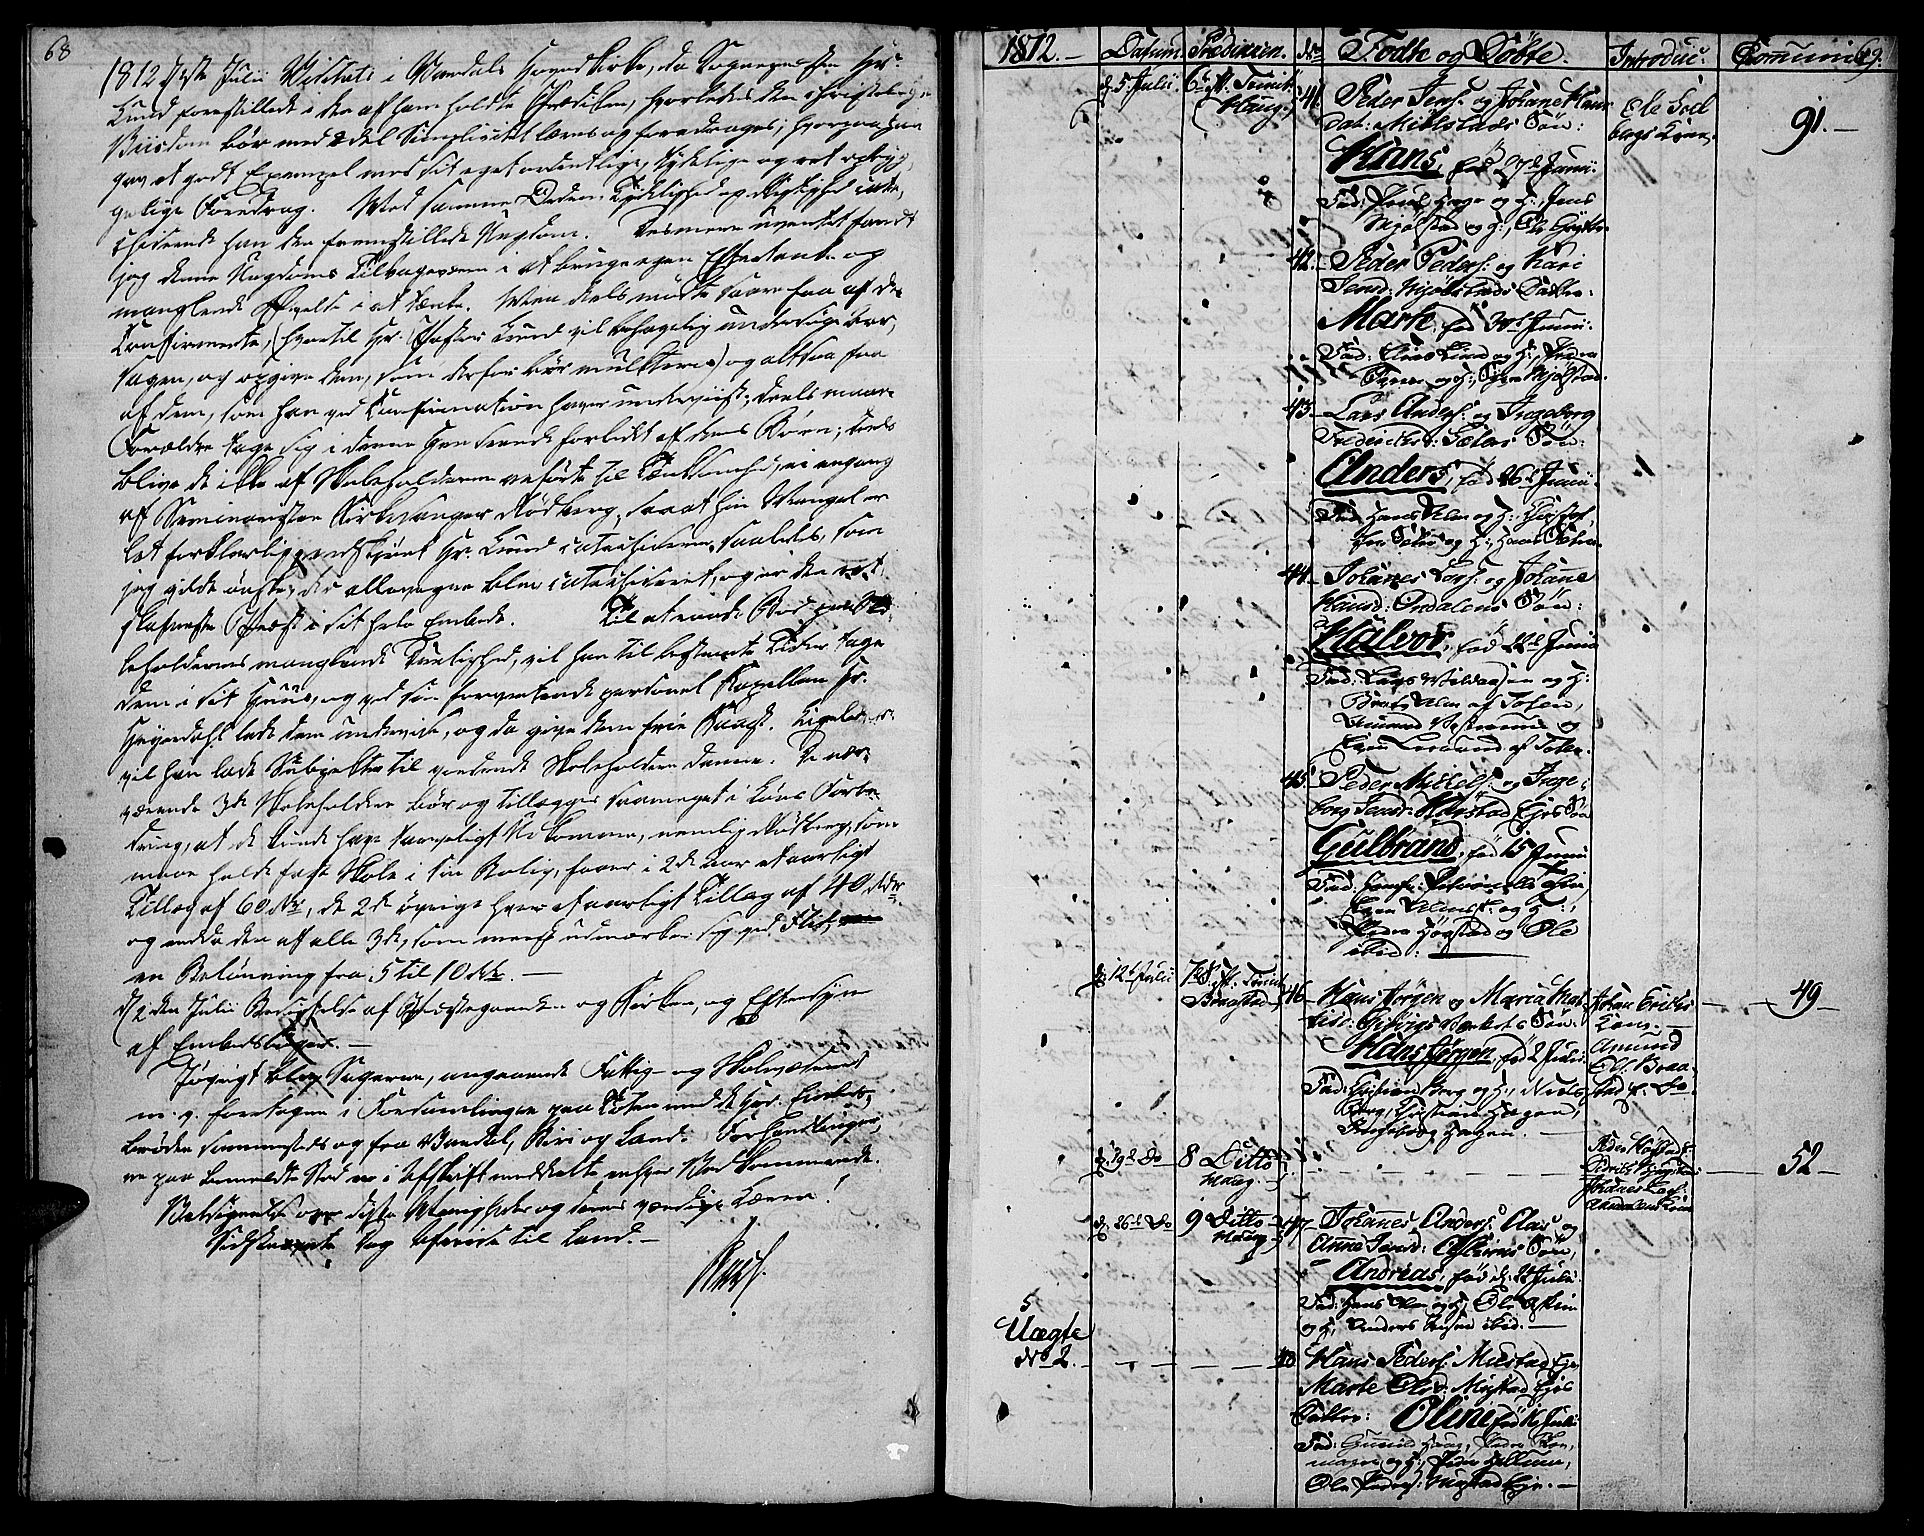 SAH, Vardal prestekontor, H/Ha/Haa/L0003: Ministerialbok nr. 3, 1808-1814, s. 68-69